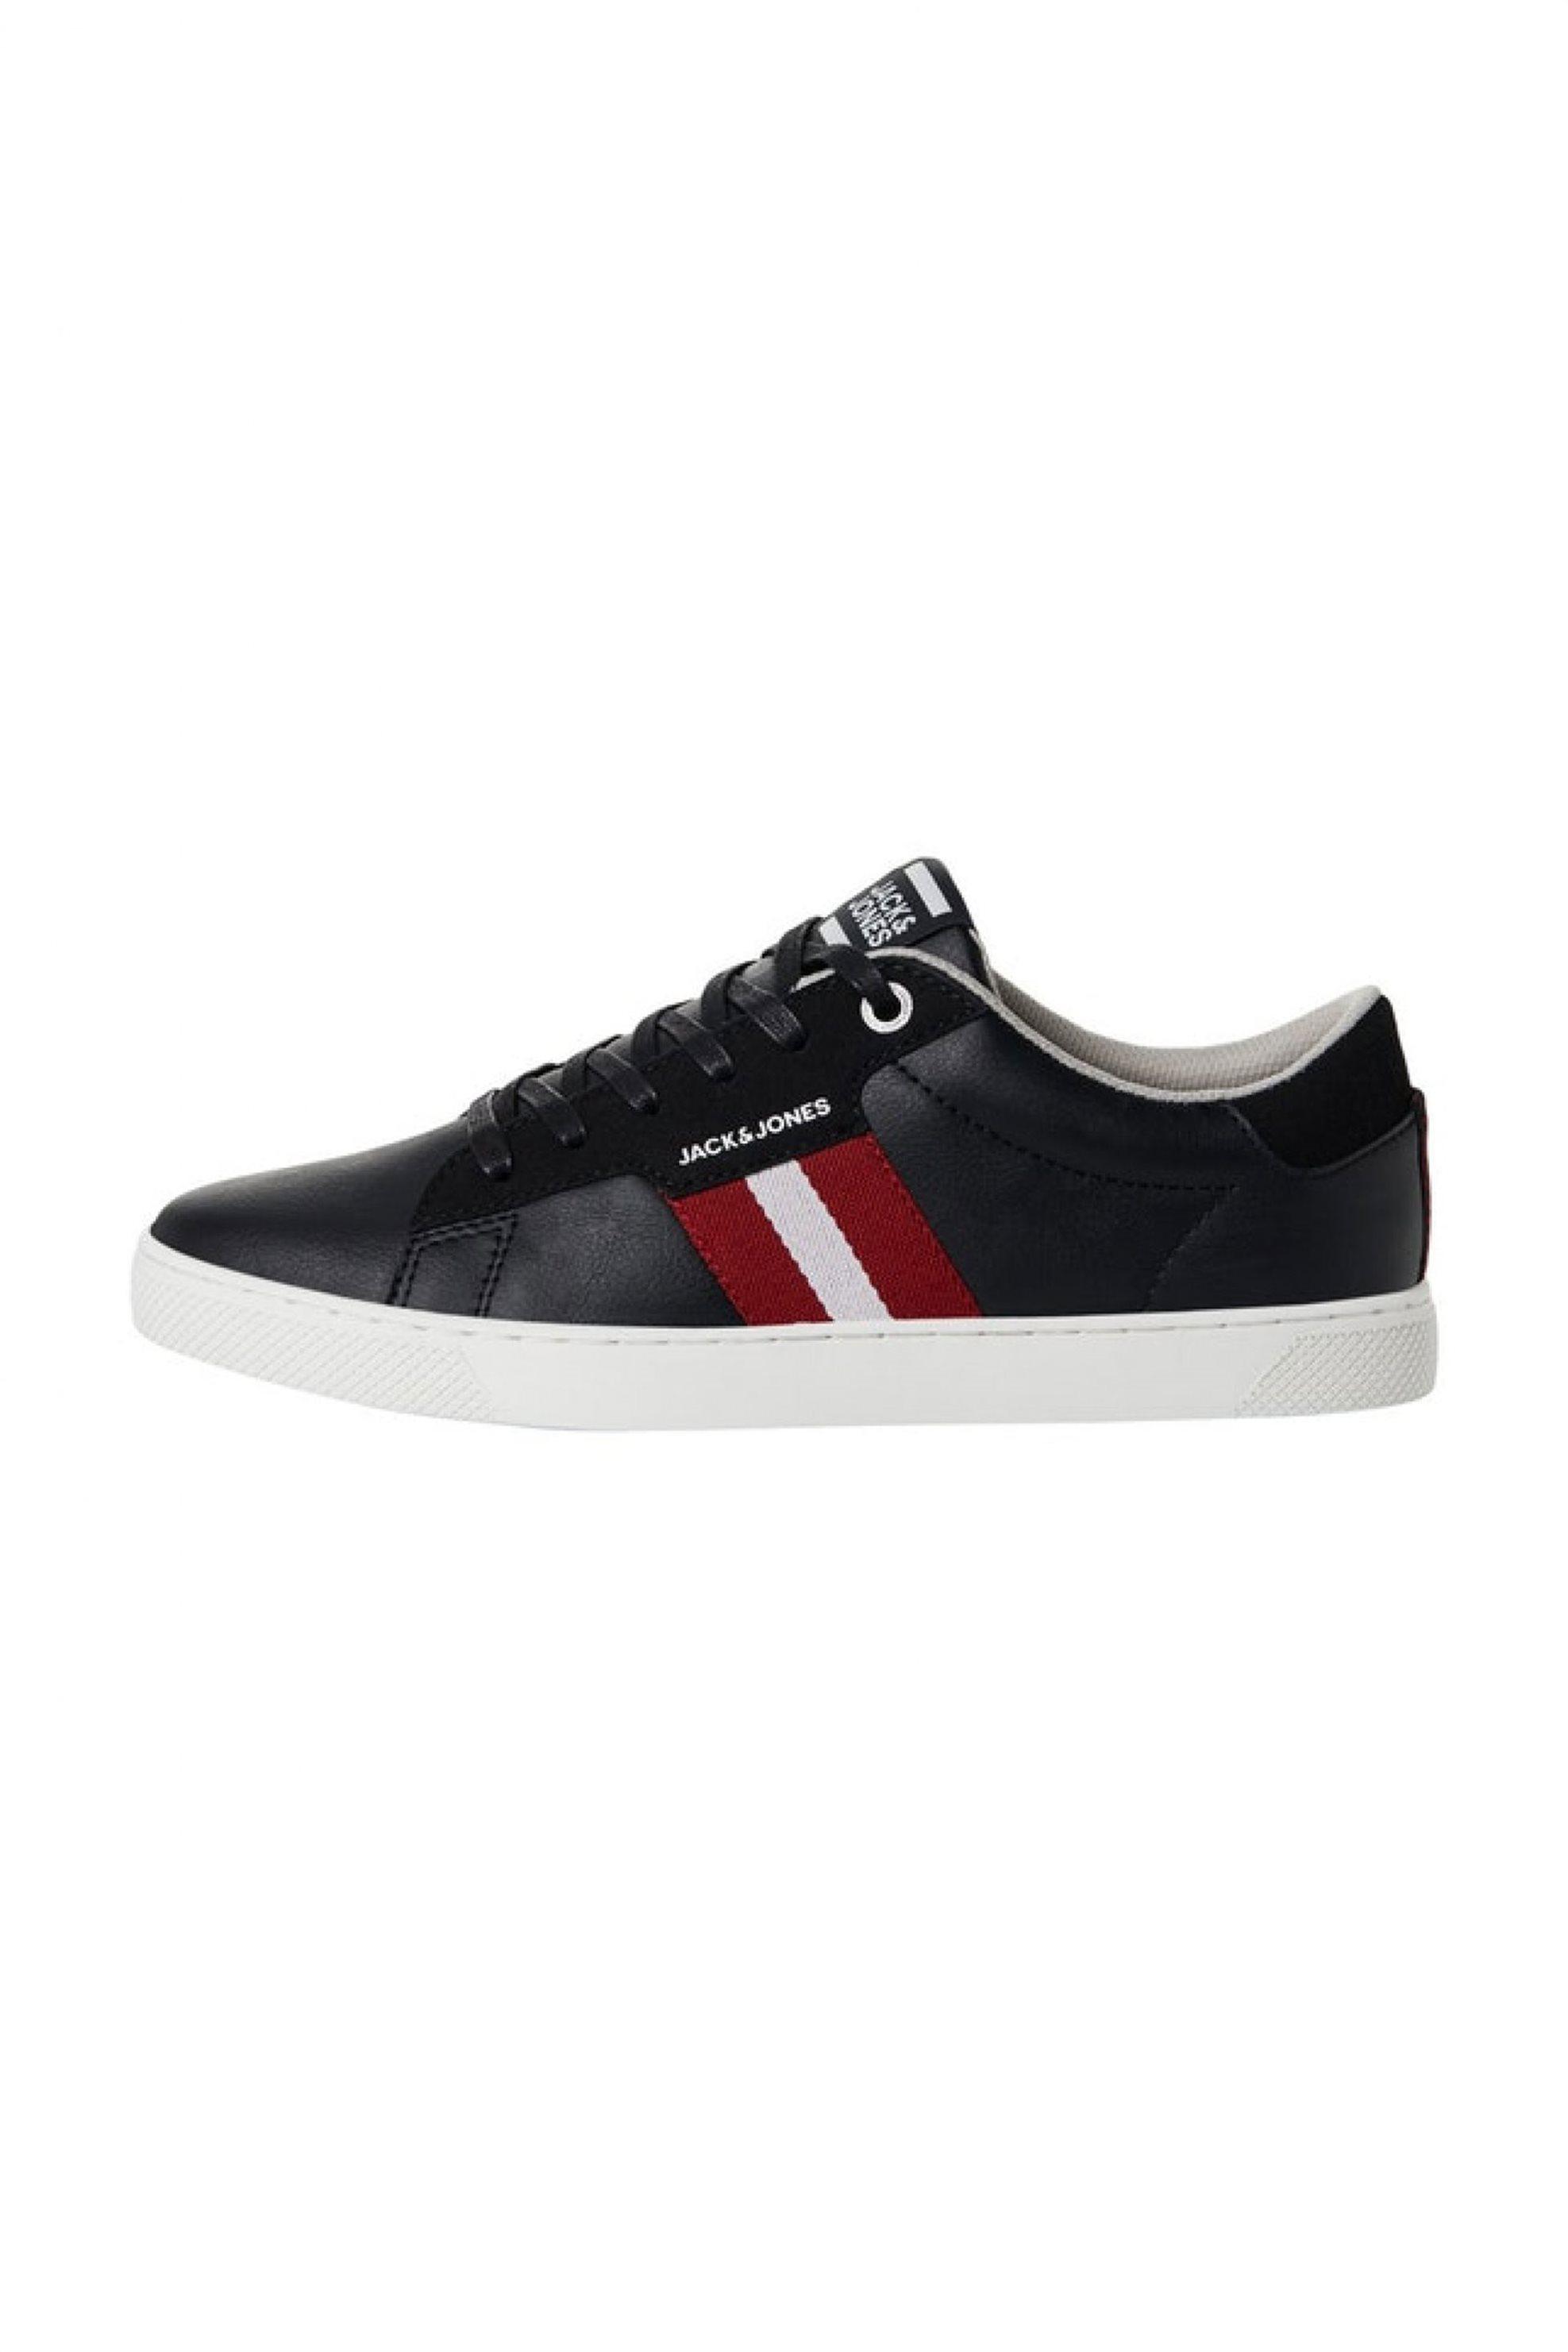 JACK & JONES ανδρικά sneakers με ριγέ λεπτομέρειες – 12177351 – Ανθρακί